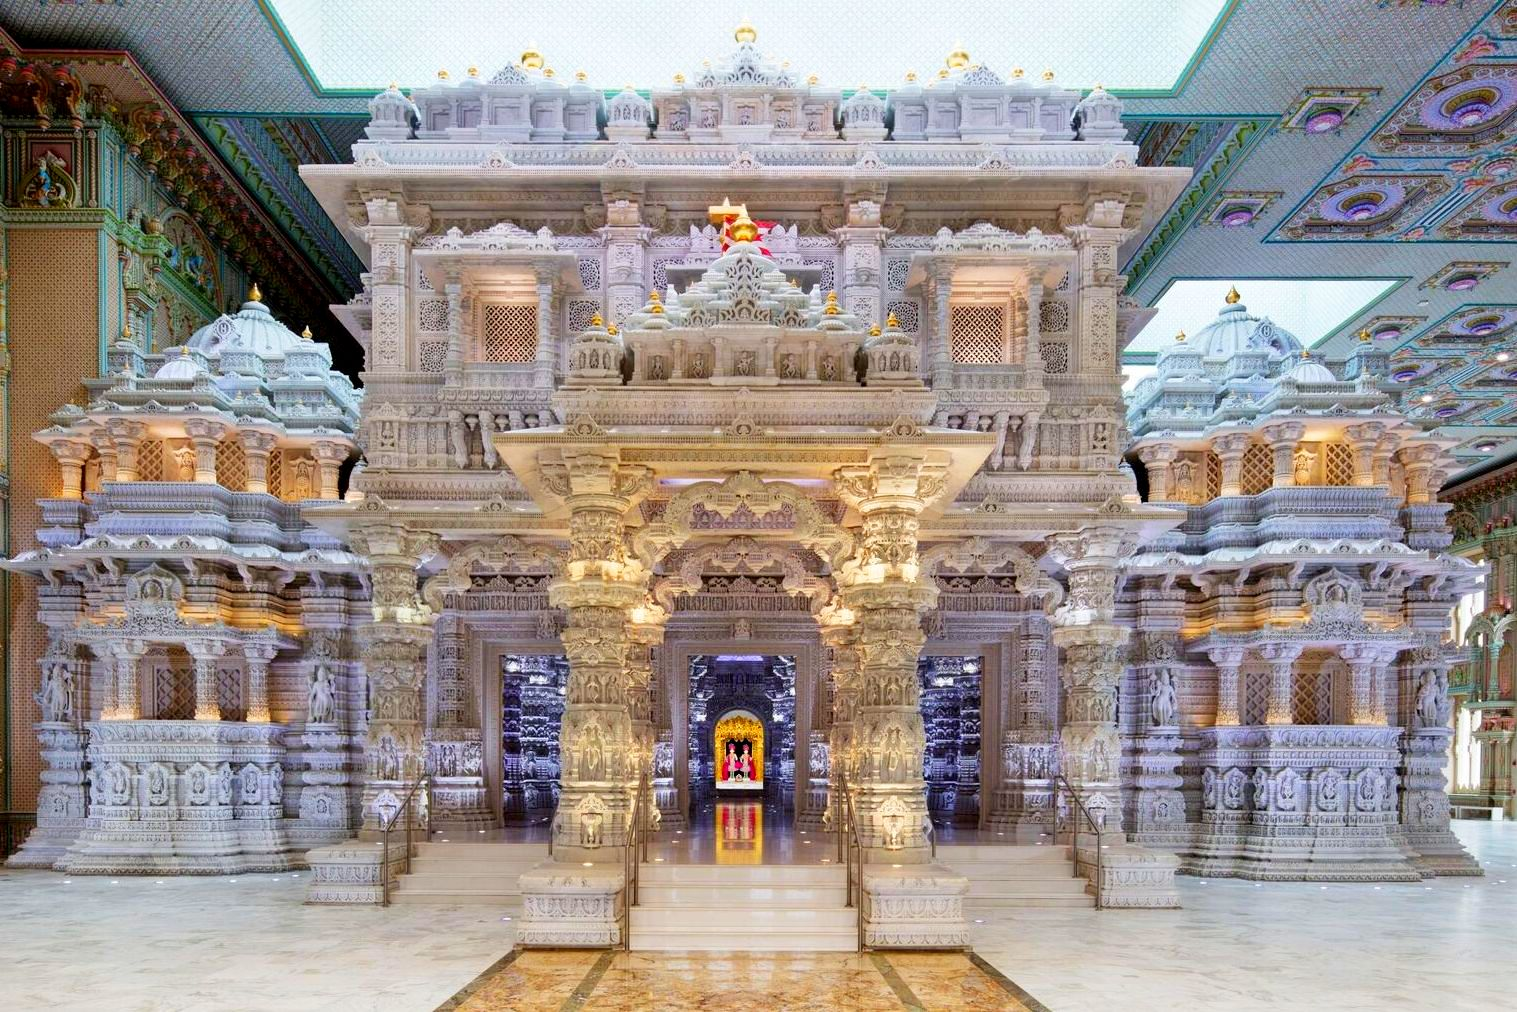 BAPS Shri Swaminarayan Mandir, Robbinsville